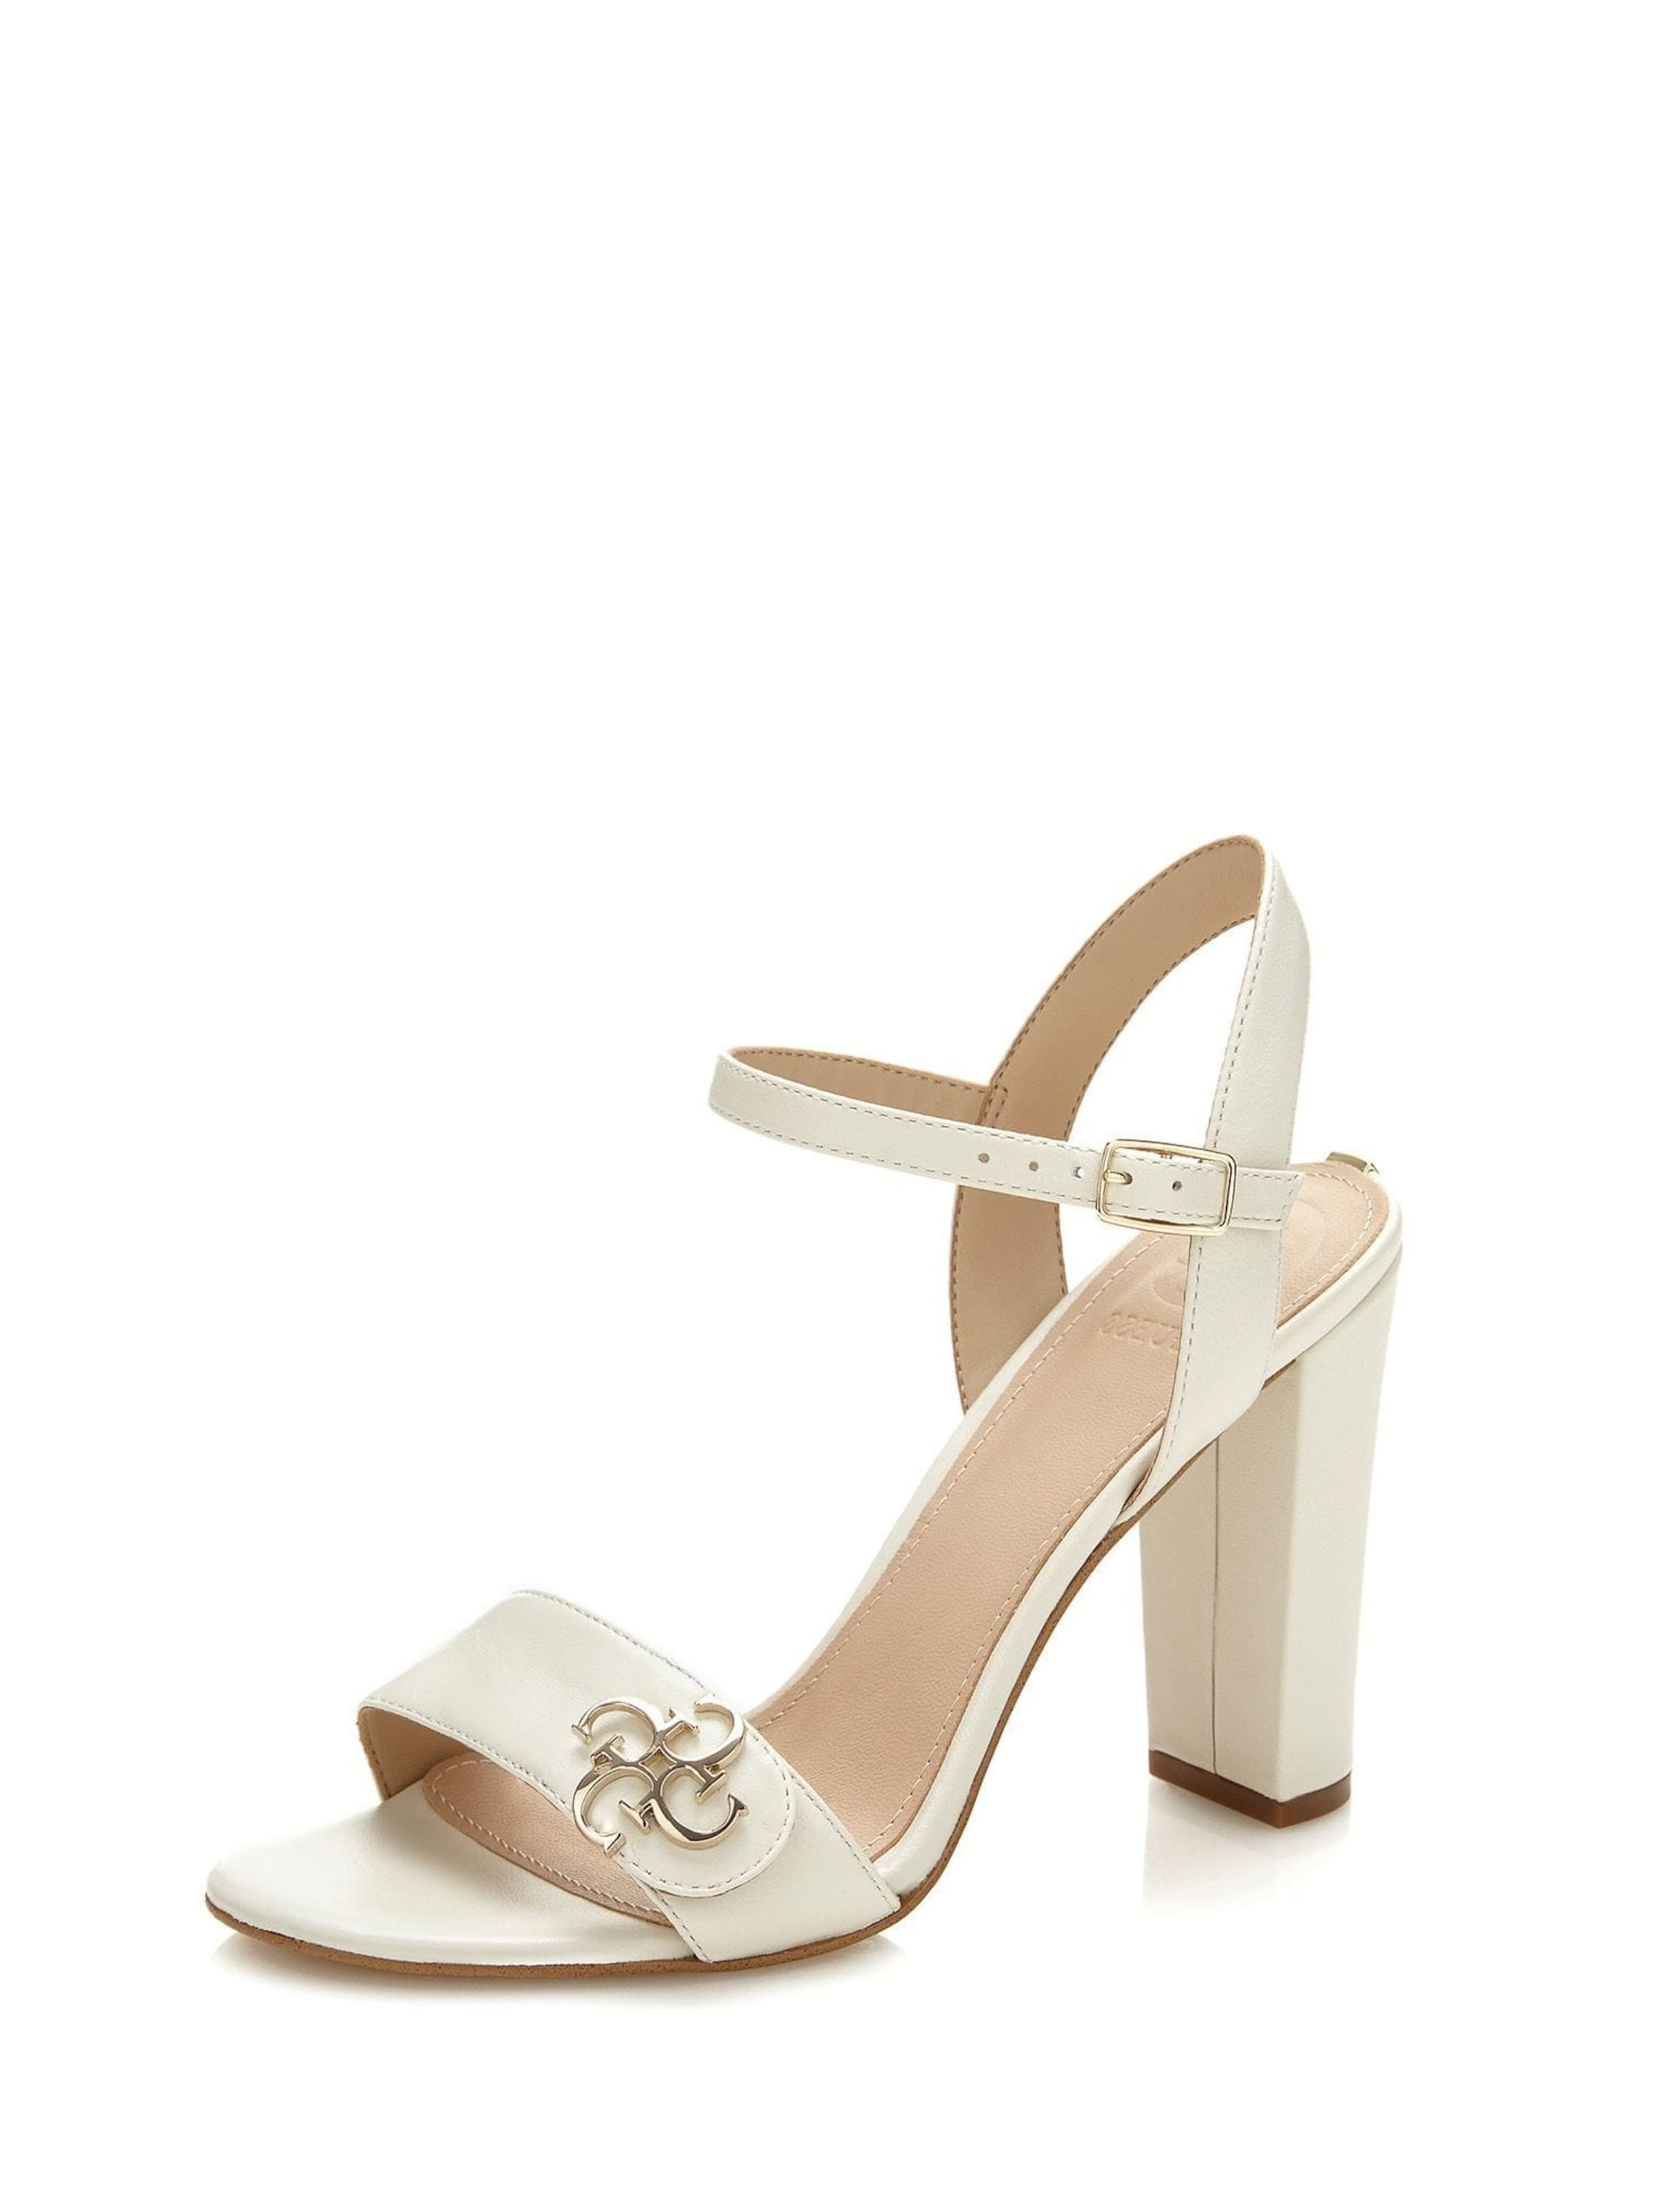 GUESS SANDALETTE LAMI Verschleißfeste billige Schuhe